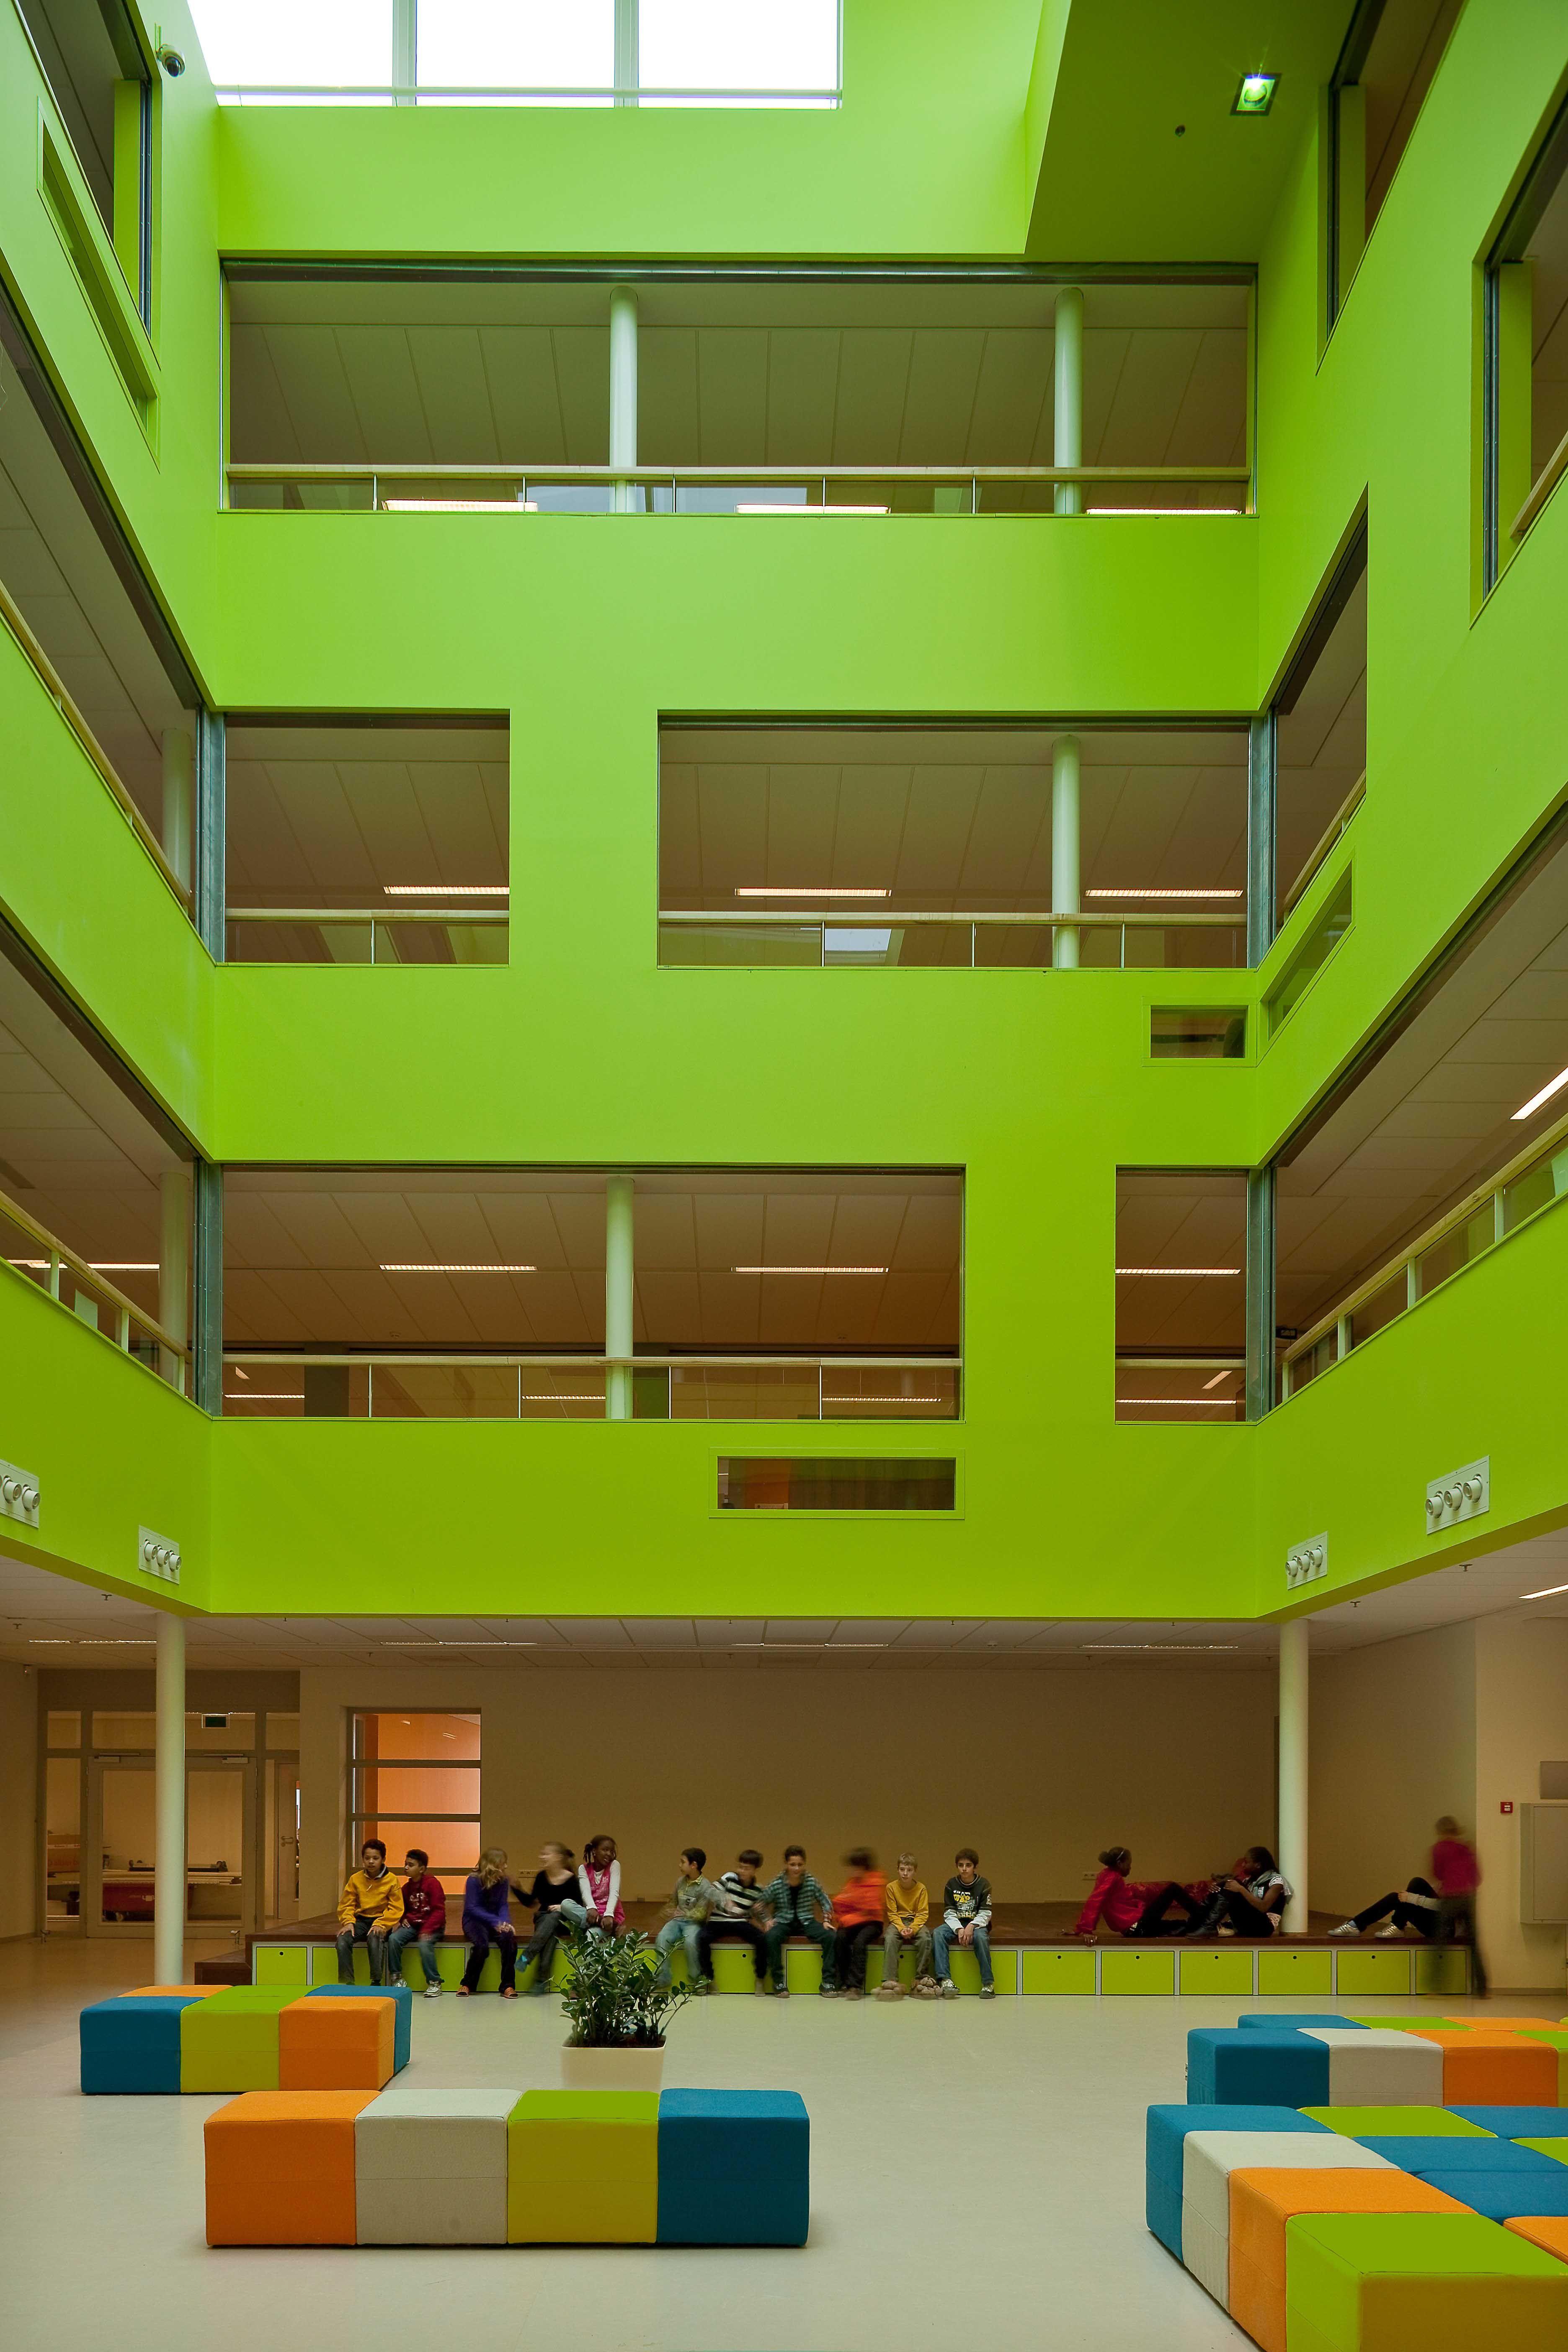 Transformation Community School Nieuwstraat In Rotterdam Netherlands